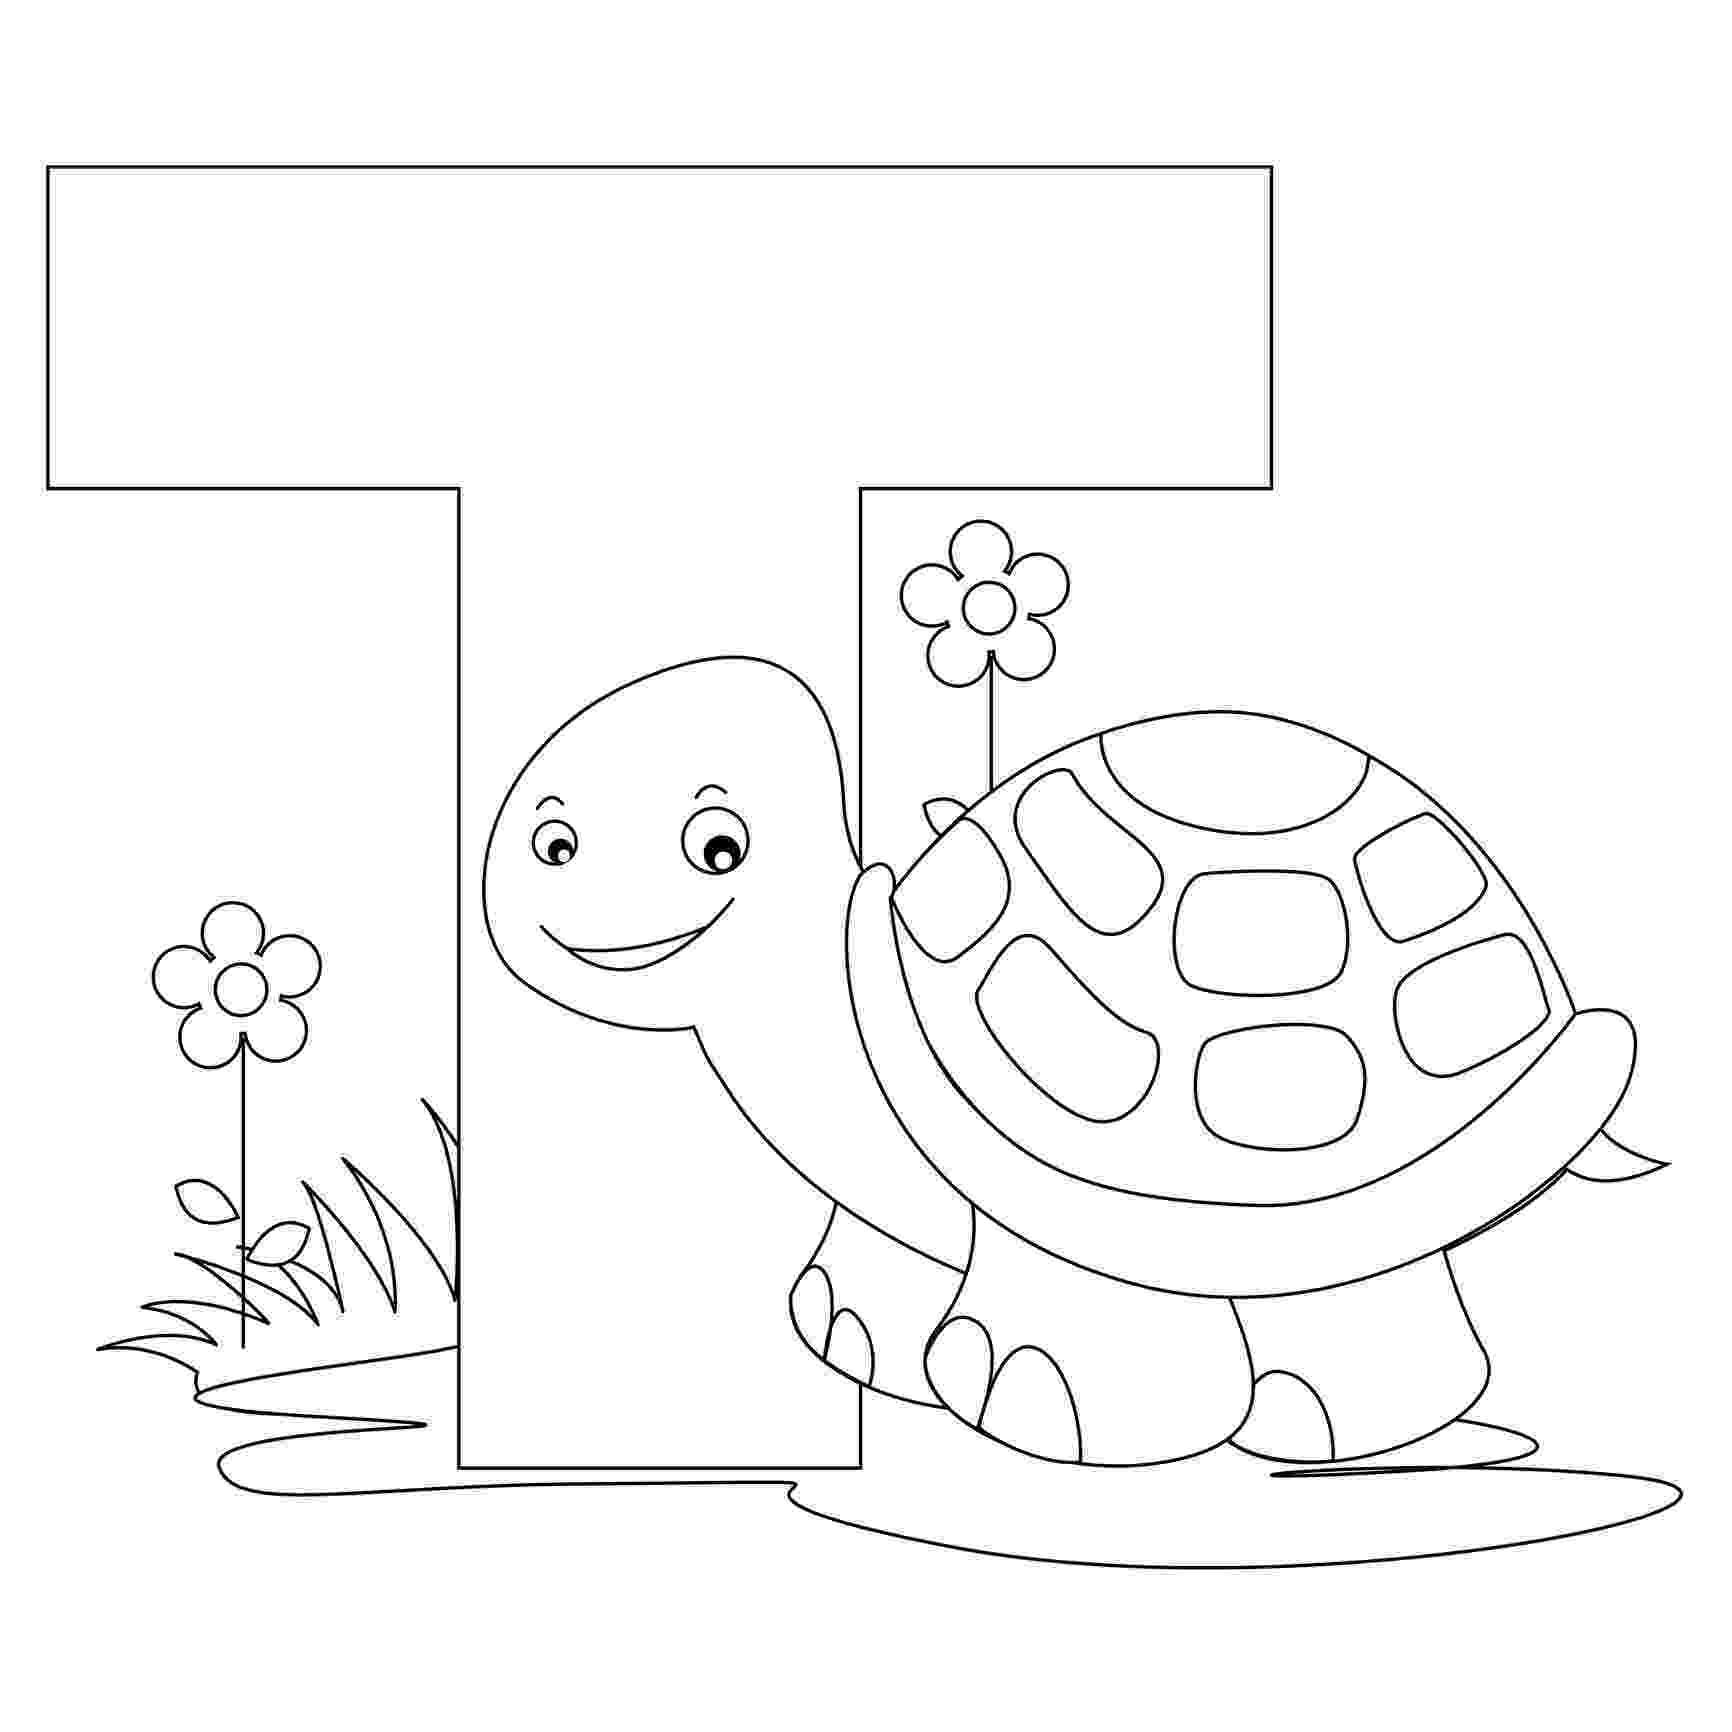 coloring animal alphabet free printable alphabet coloring pages for kids best animal coloring alphabet 1 2